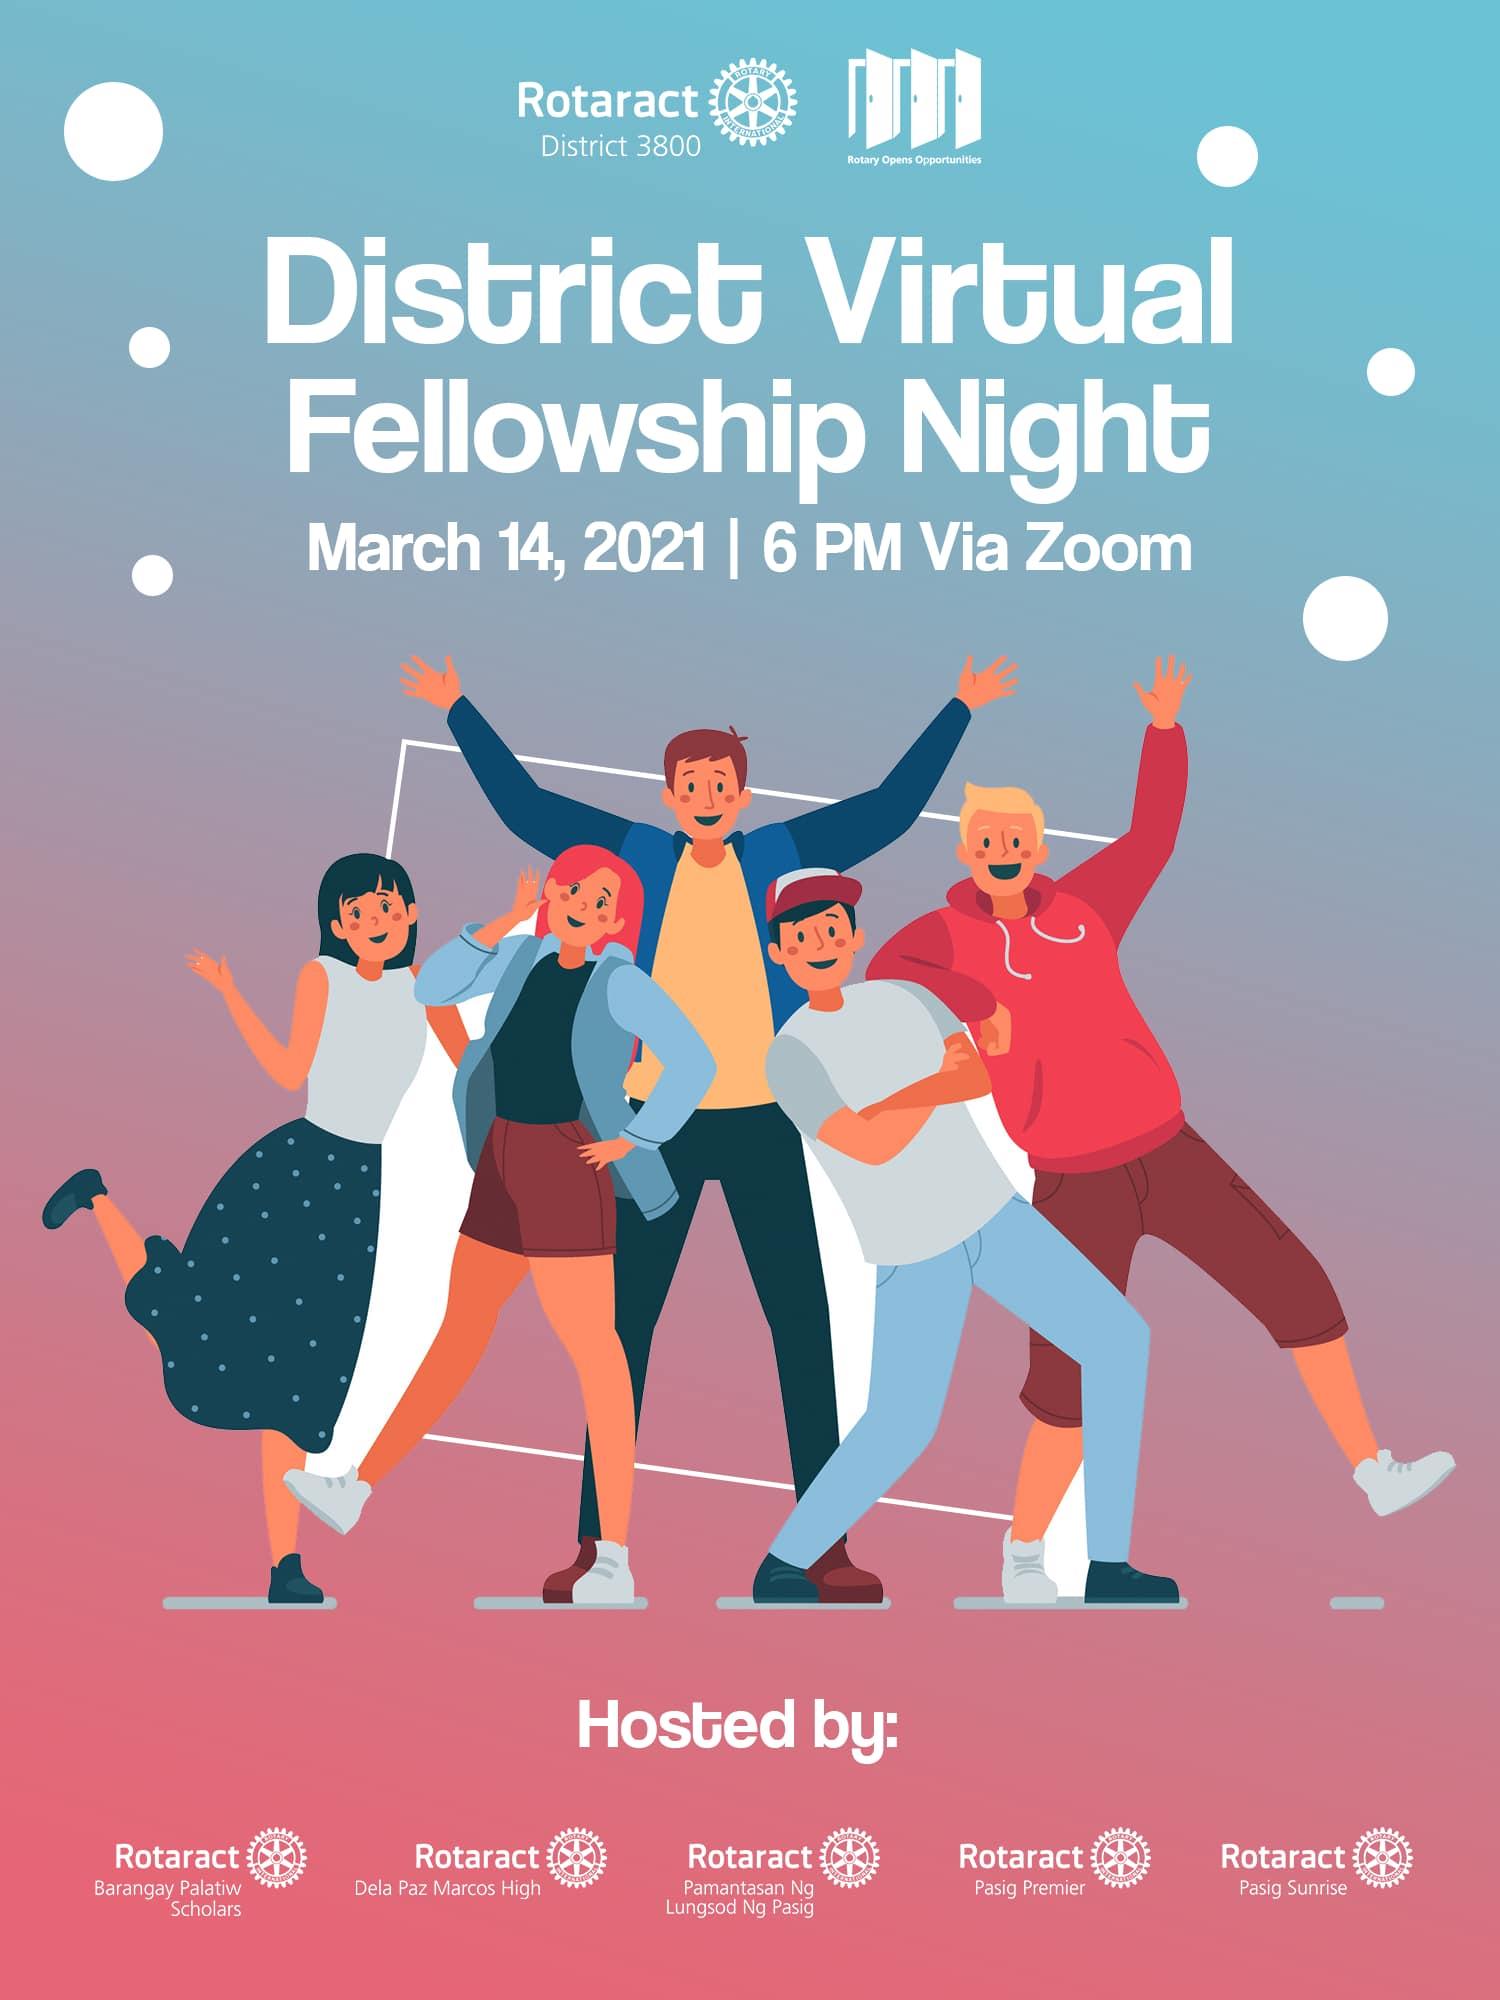 District 3800 Virtual Rotaract Fellowship Night